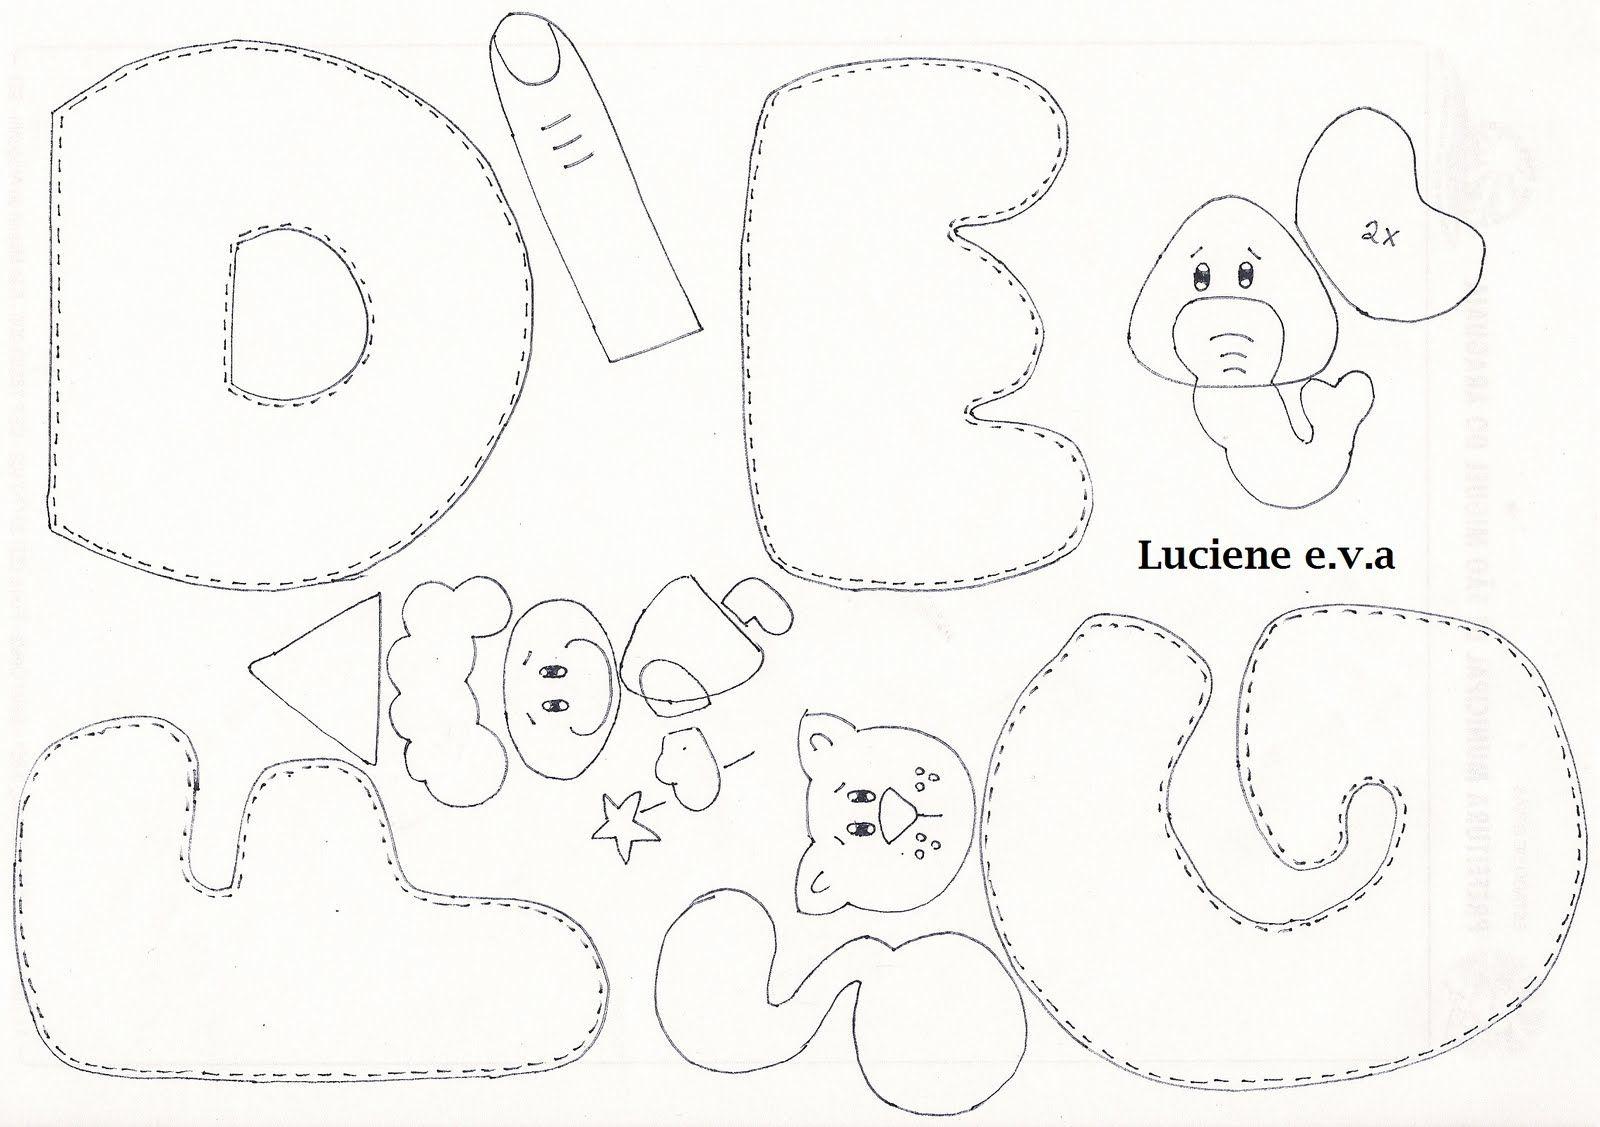 Luciene e.v.a: alfabeto ilustrado